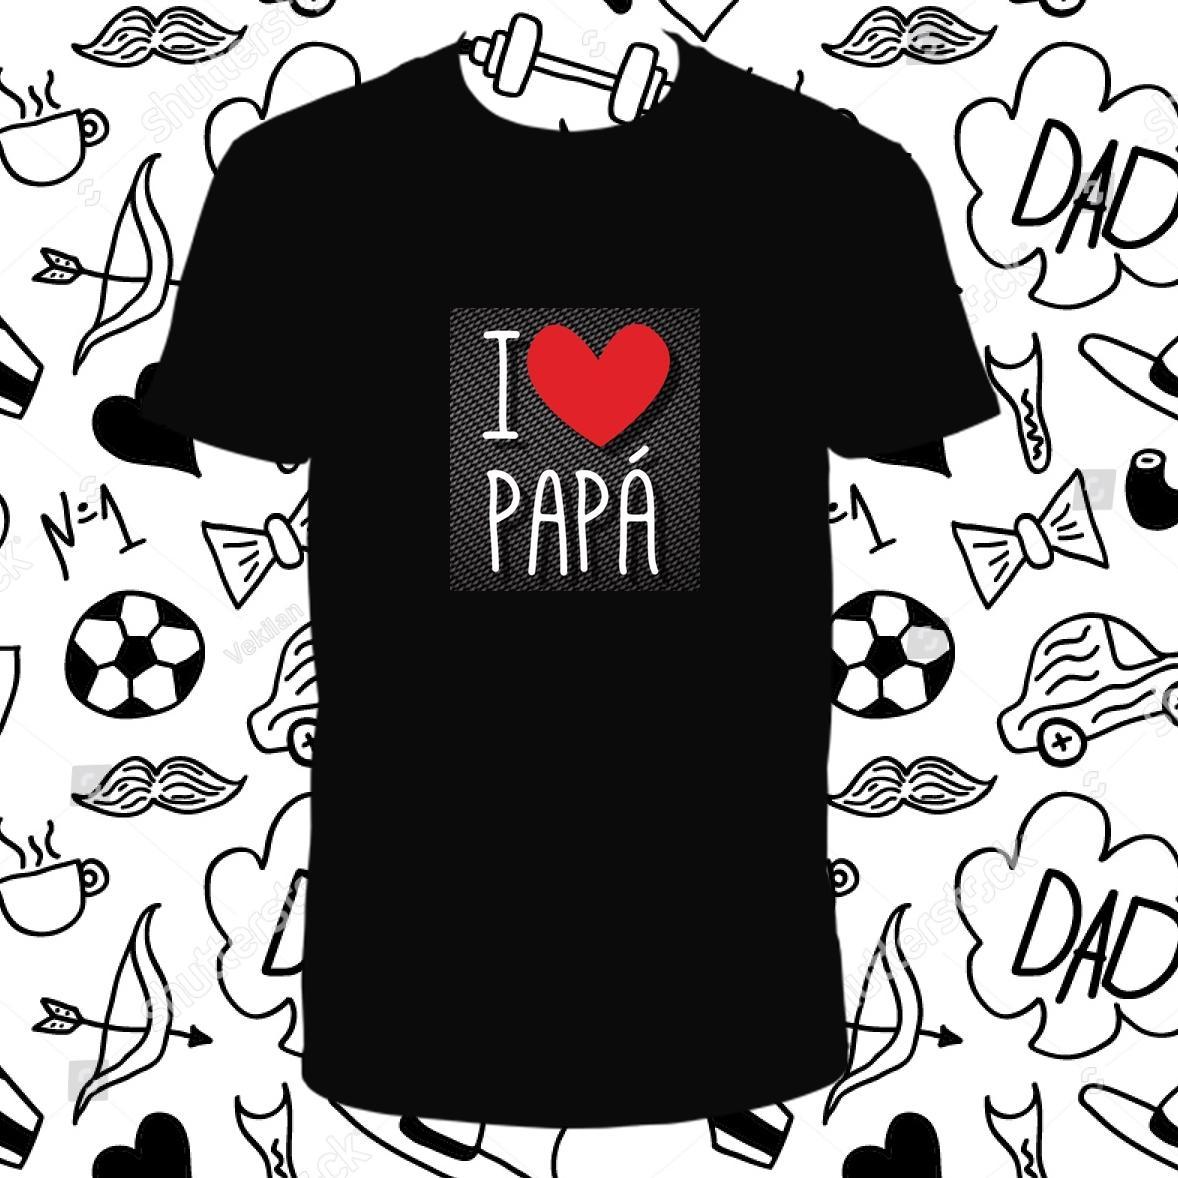 Camiseta I LOVE PAPÁ